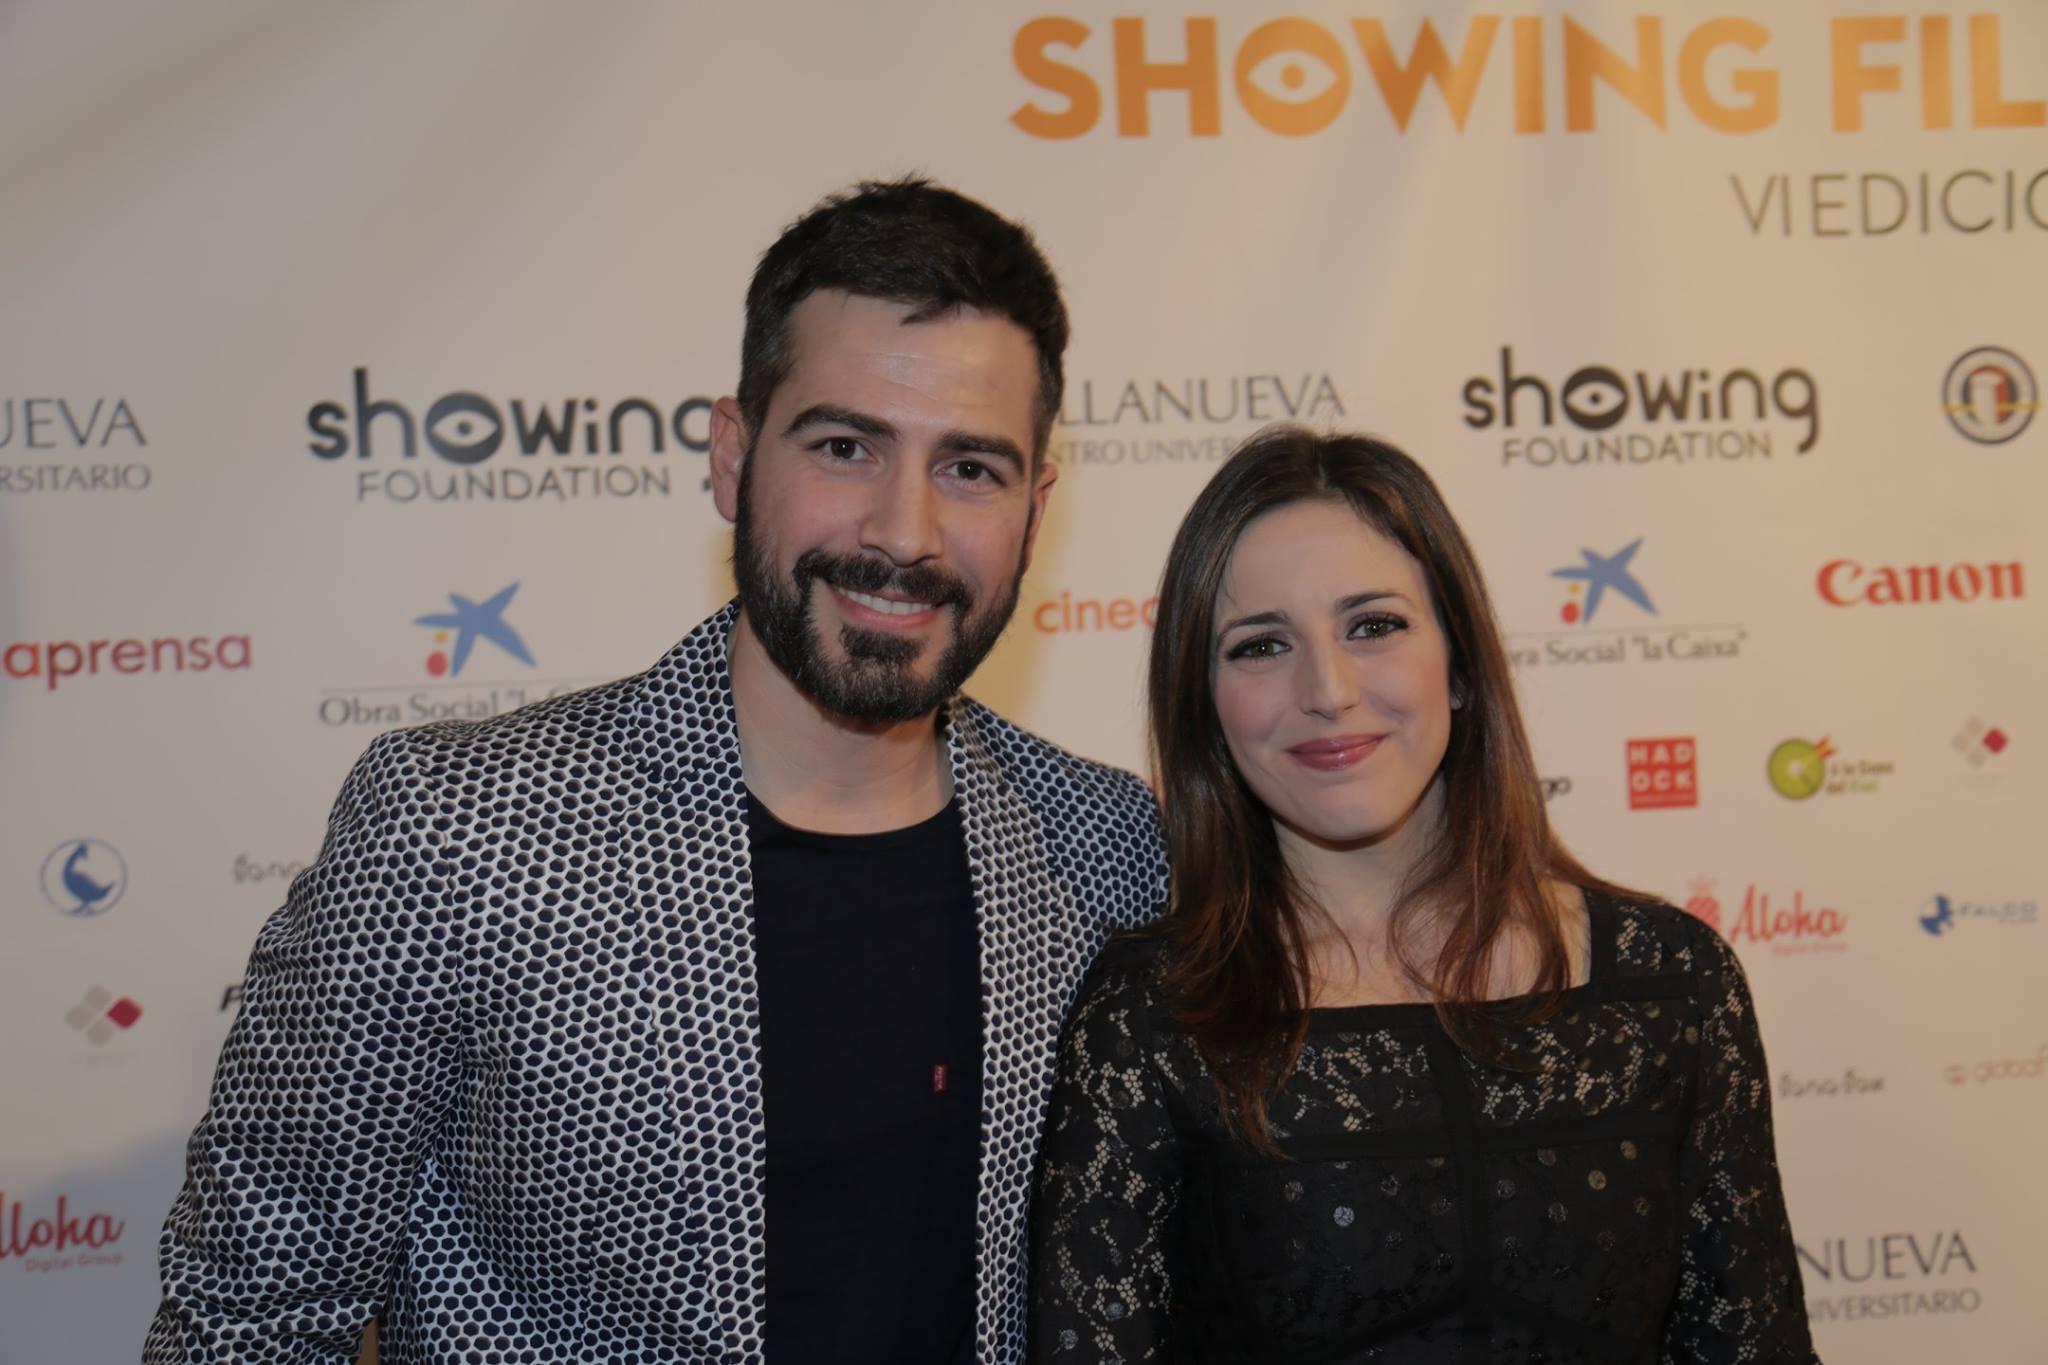 Ruth Núñez en los Showing Film Awards